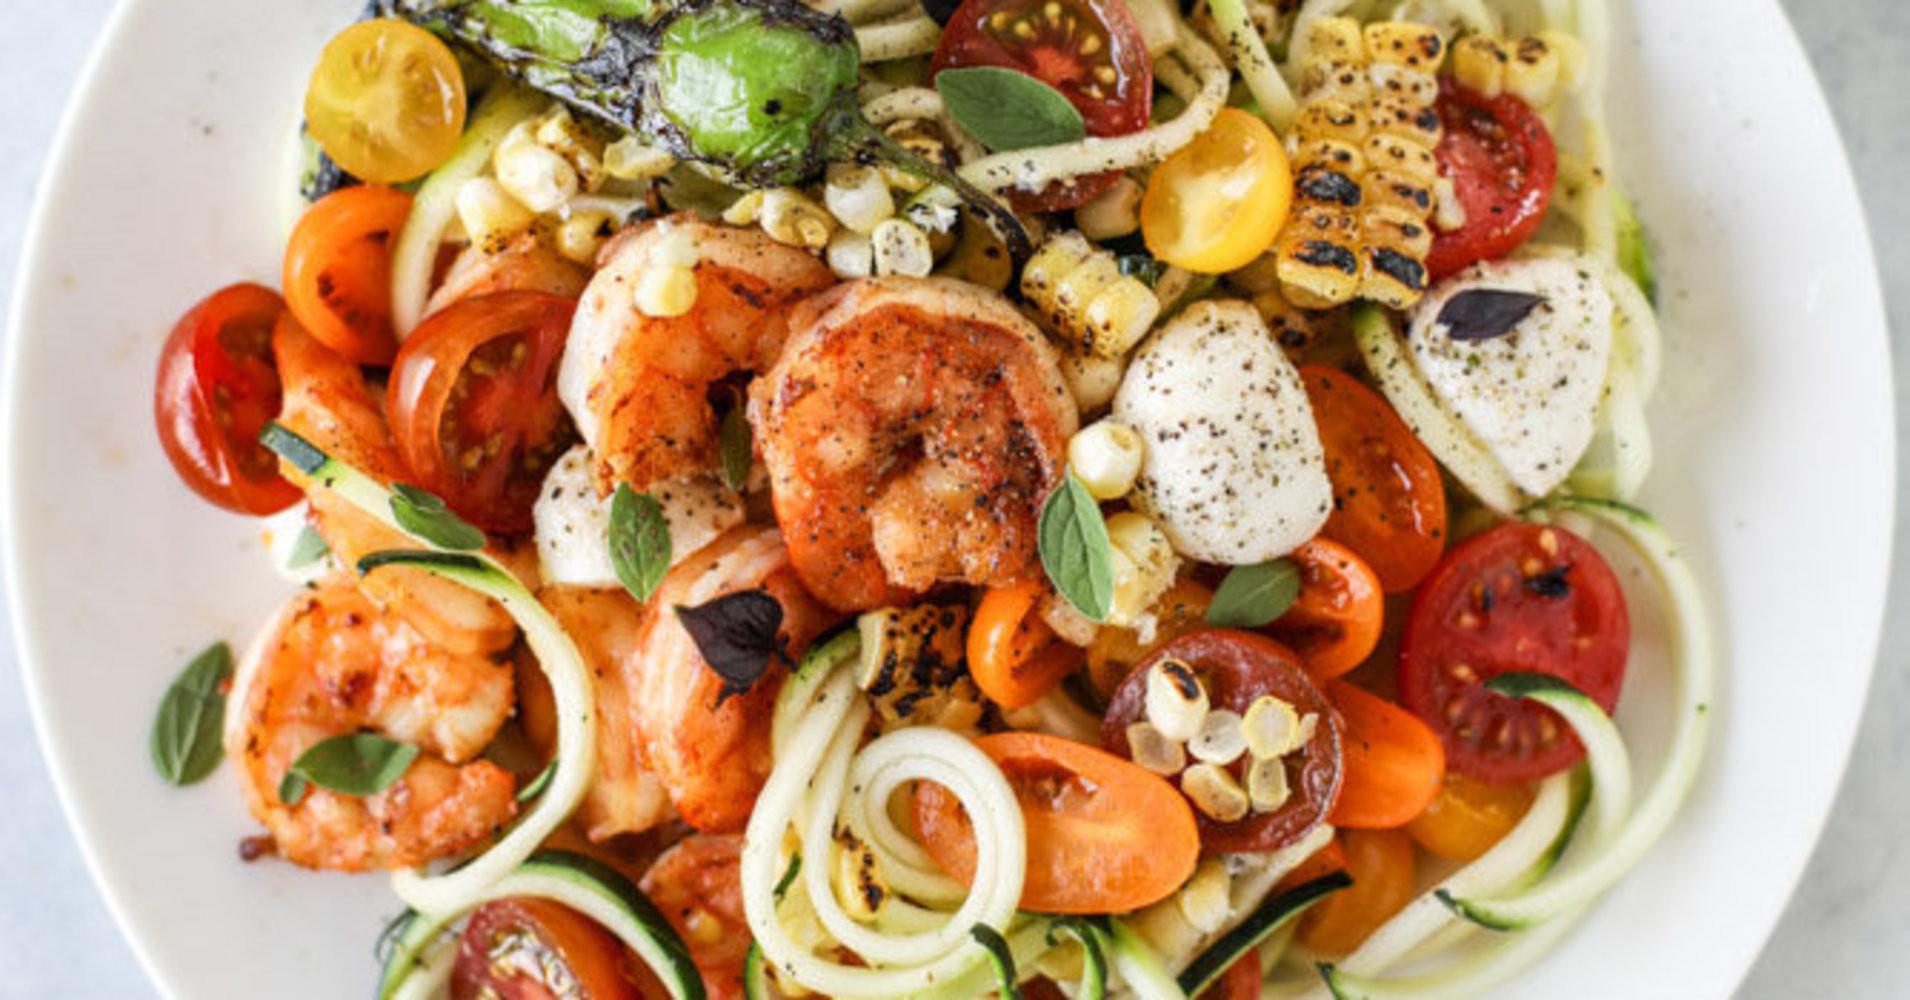 Good Summer Dinners Recipes  The Best Summer Dinner Recipes Around